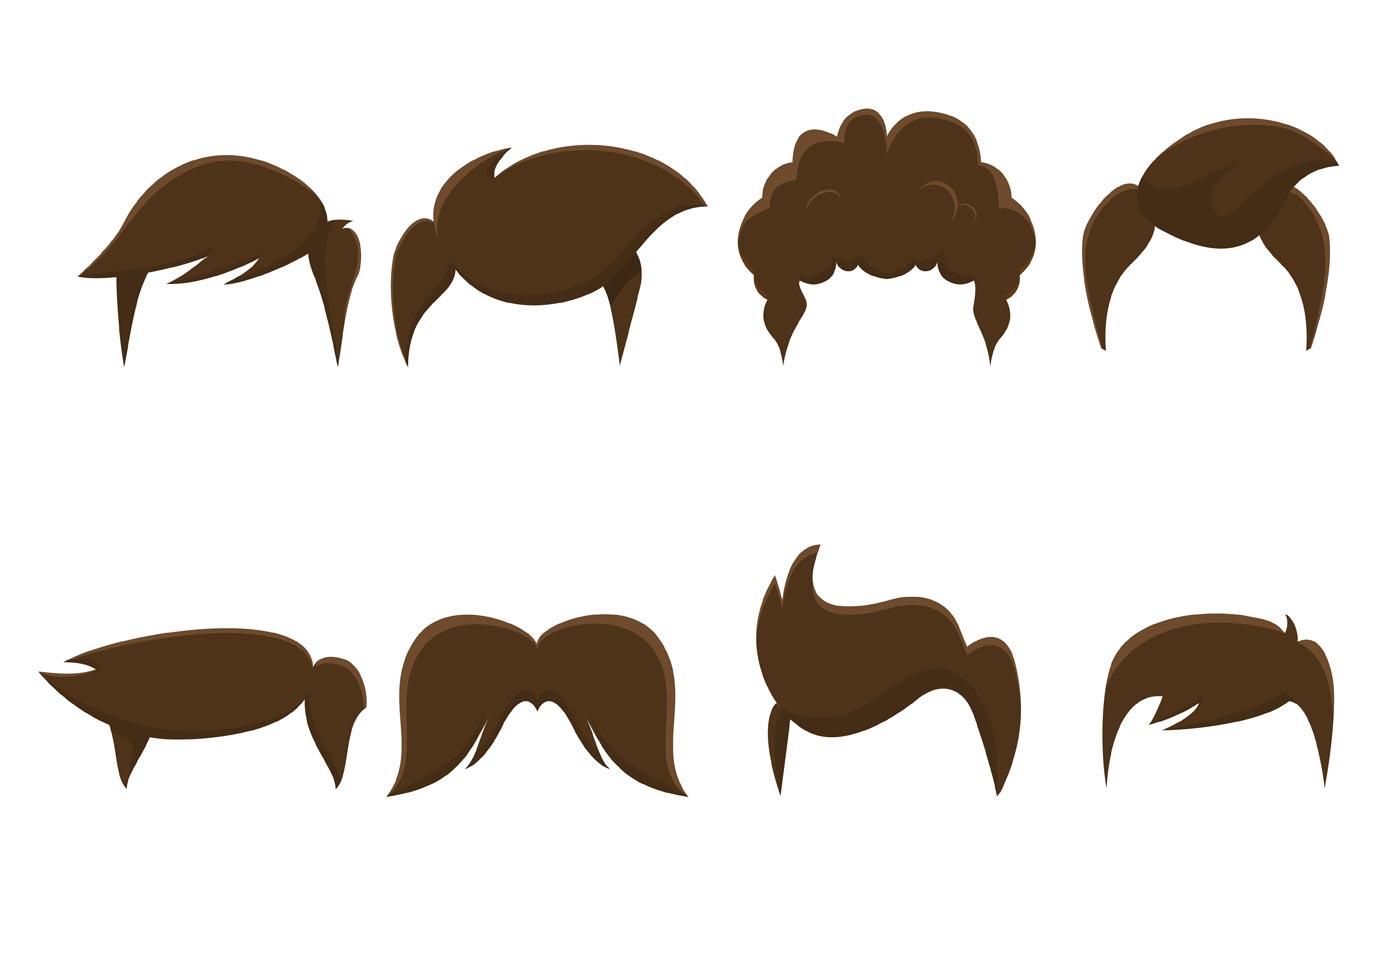 Free Vector Hair Styles - Download Free Vector Art, Stock ... Men Hair Clipart